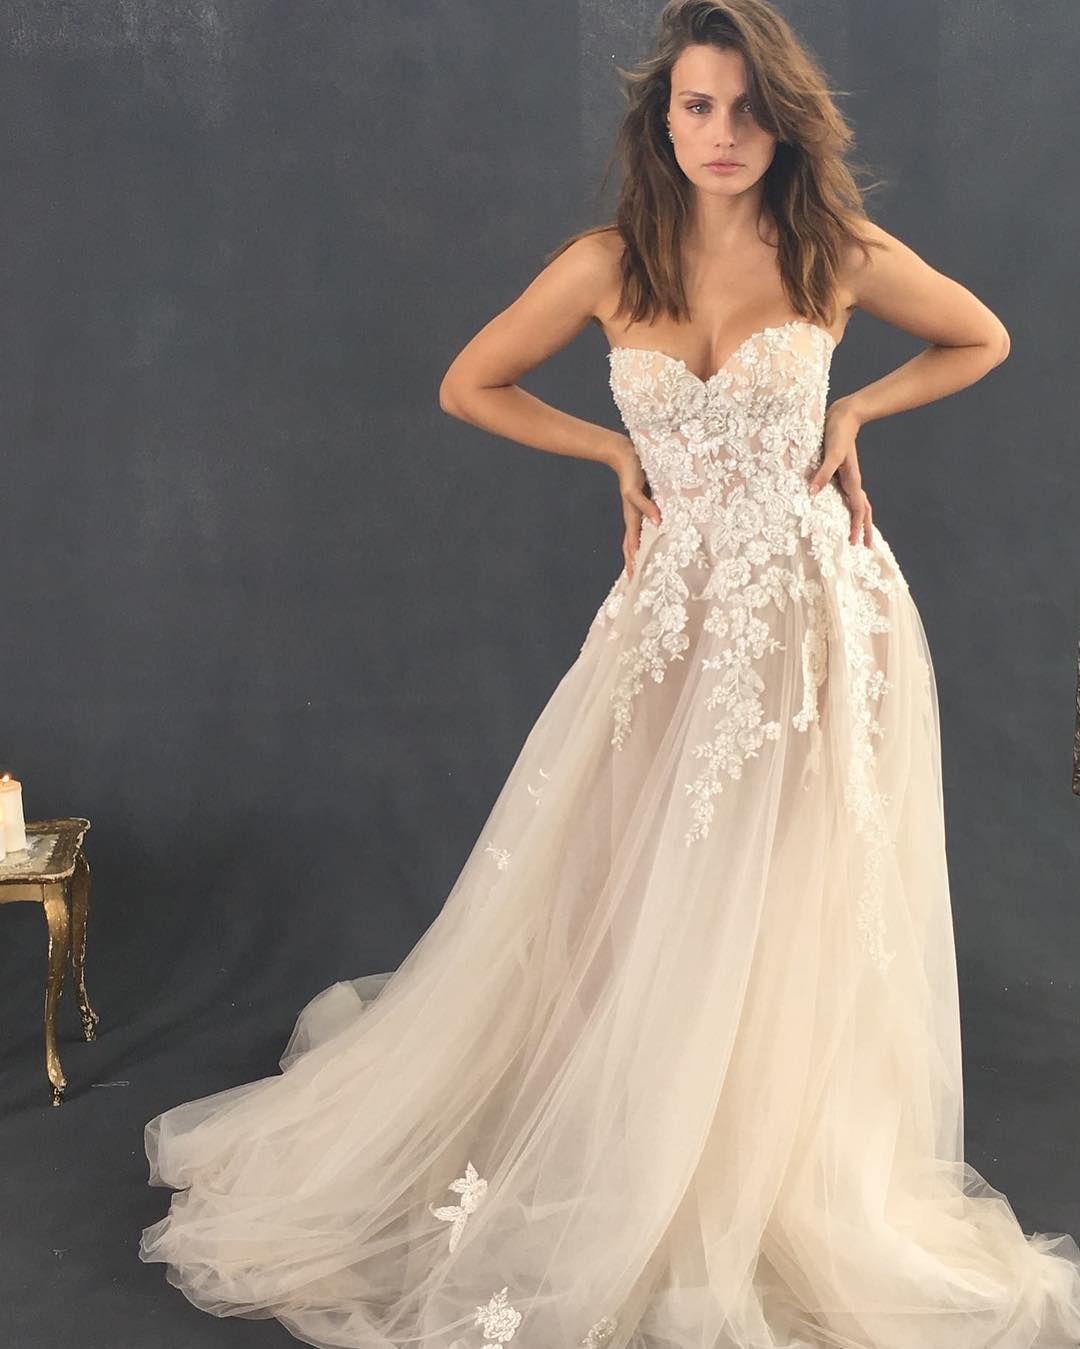 Princess Wedding Dresses, Pink Wedding Dreses, Ball Gown Wedding ...